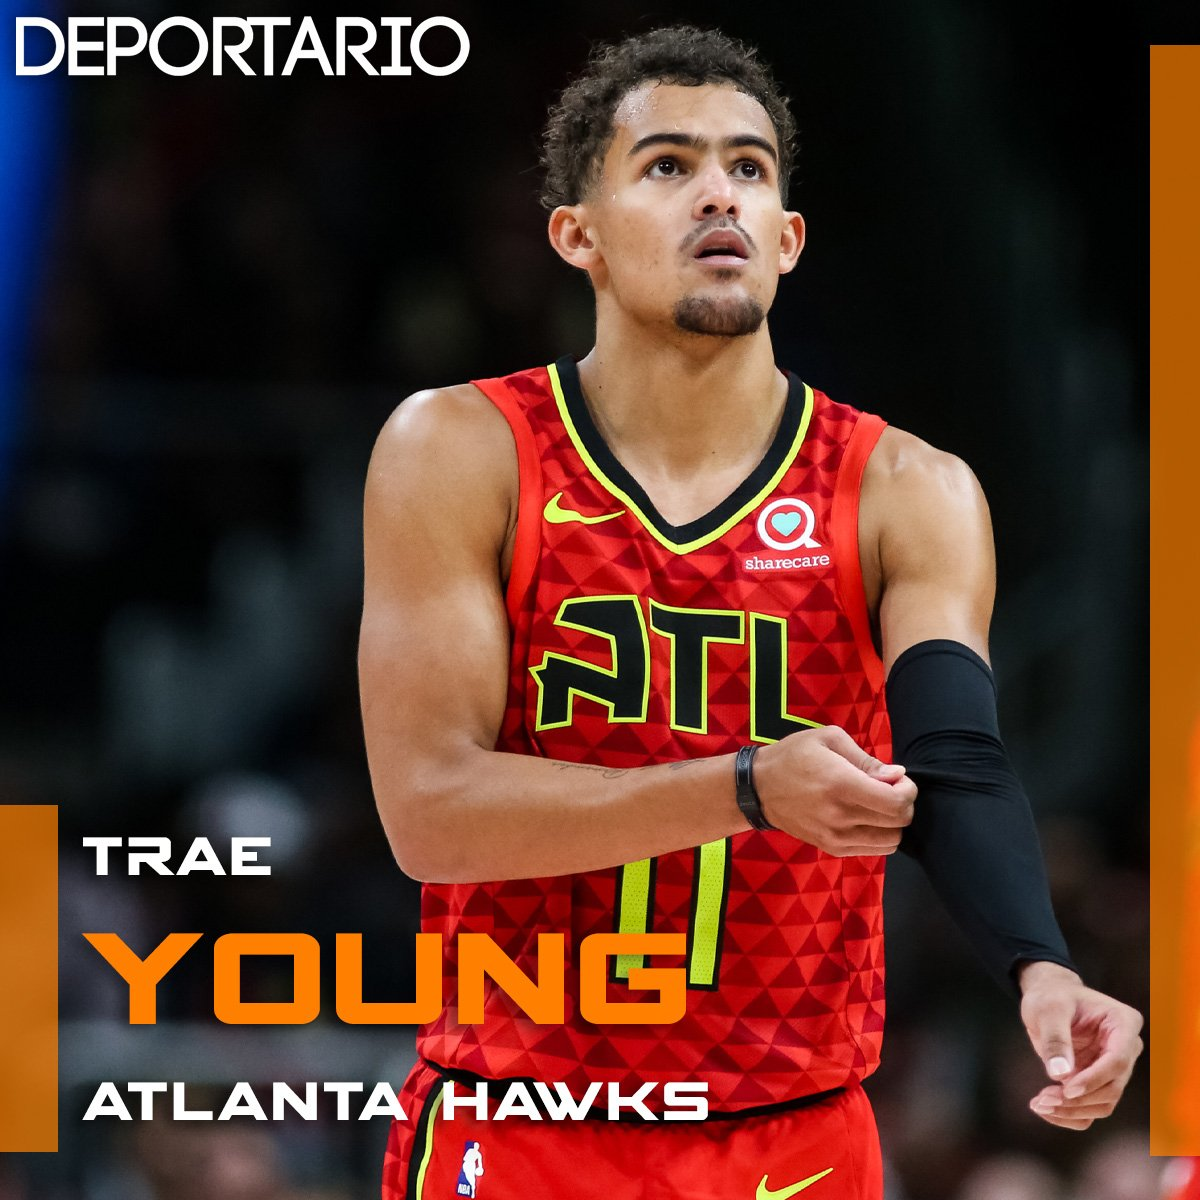 #NBA   Acción del miércoles en la @NBA:  🏀 #TrueToAtlanta 115 (Young 32 pts) – #MagicTogether 112 (Vucevic 29 pts)  🏀 #AllFly 135 (Rozier 31 pts) – #RaisedByWolves 102 (Rubio 20 pts)  @ATLHawks 🆚 @OrlandoMagic  @hornets 🆚 @Timberwolves